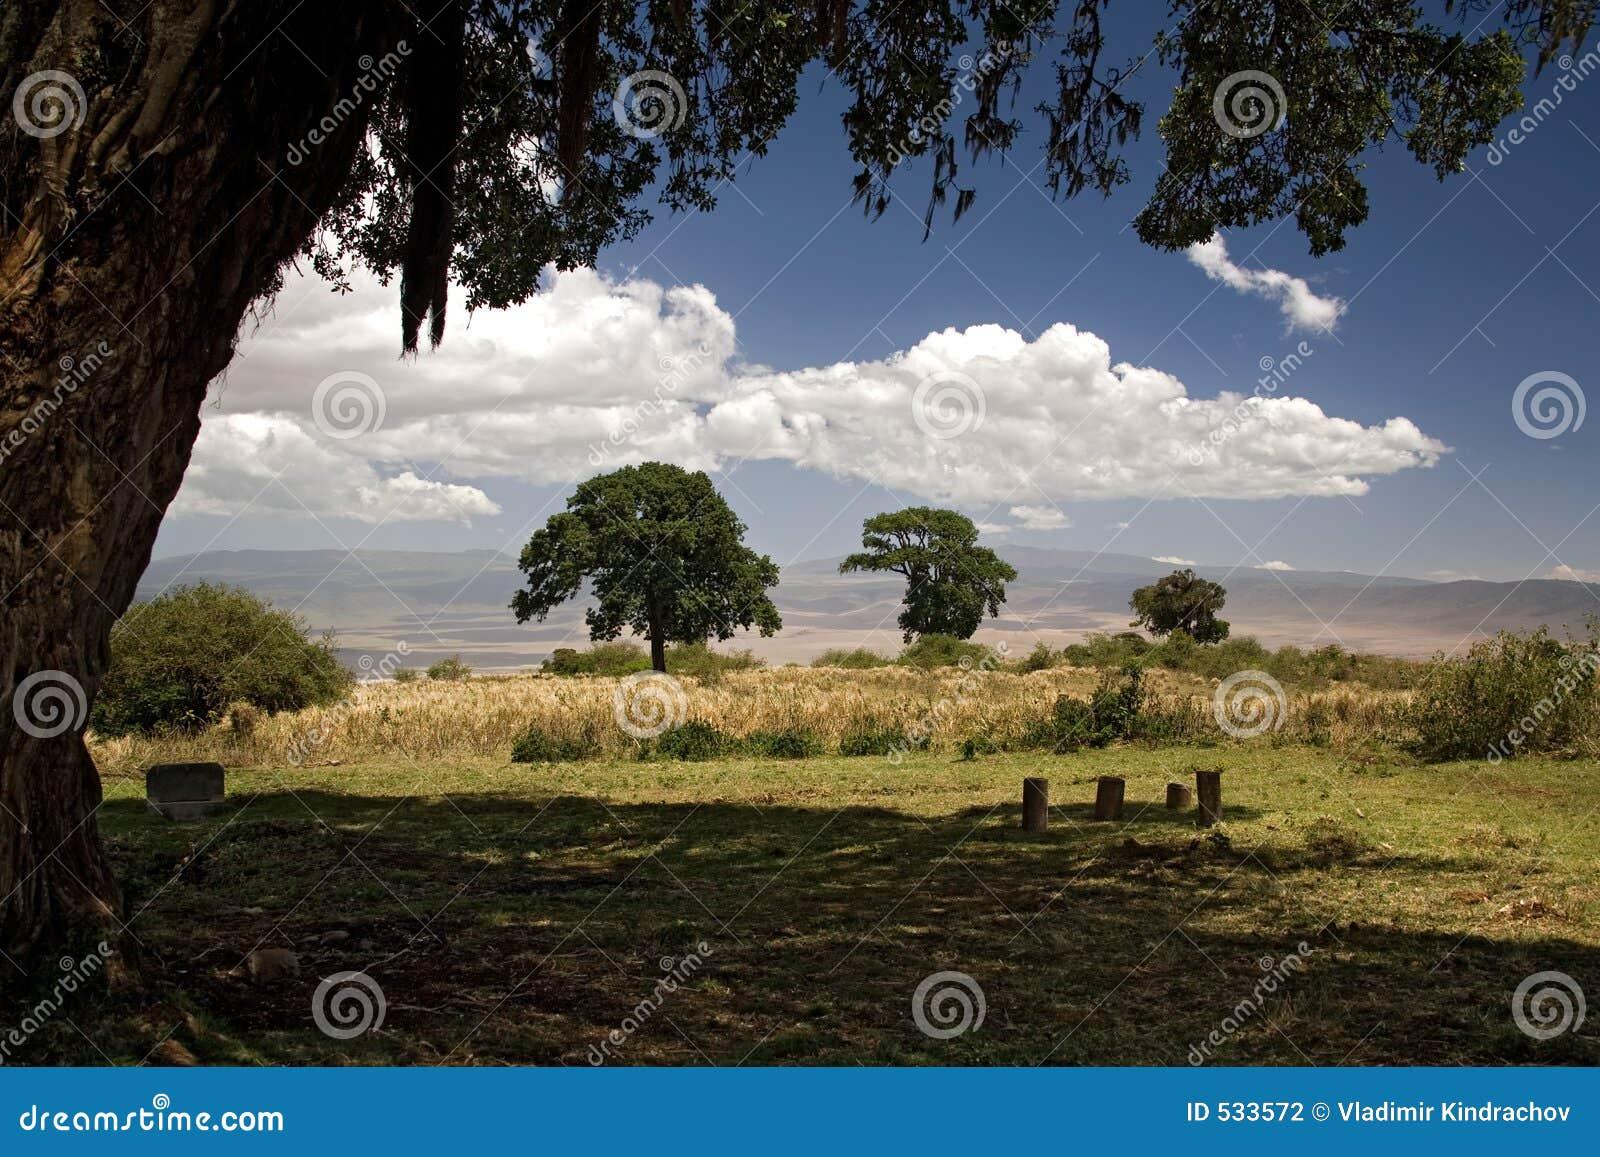 Download 016非洲横向ngorongoro 库存照片. 图片 包括有 云彩, 本质, 小山, 蓝色, 测试, 结构树 - 533572